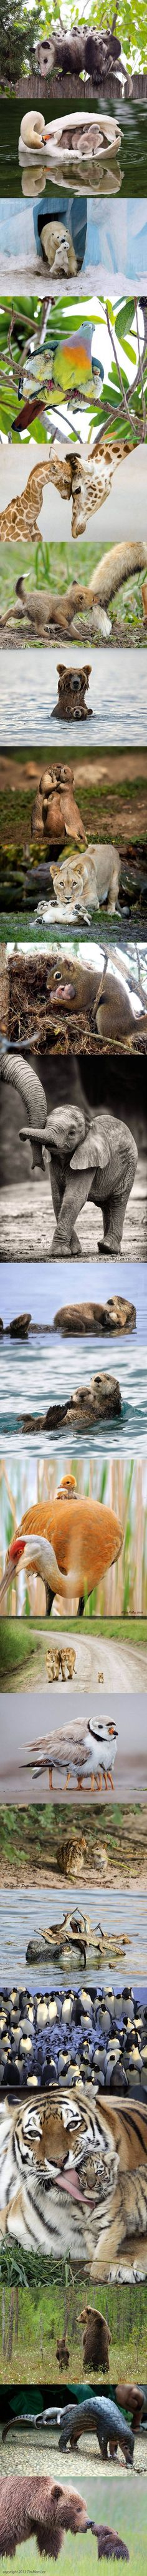 Animal parenthood - Imgur